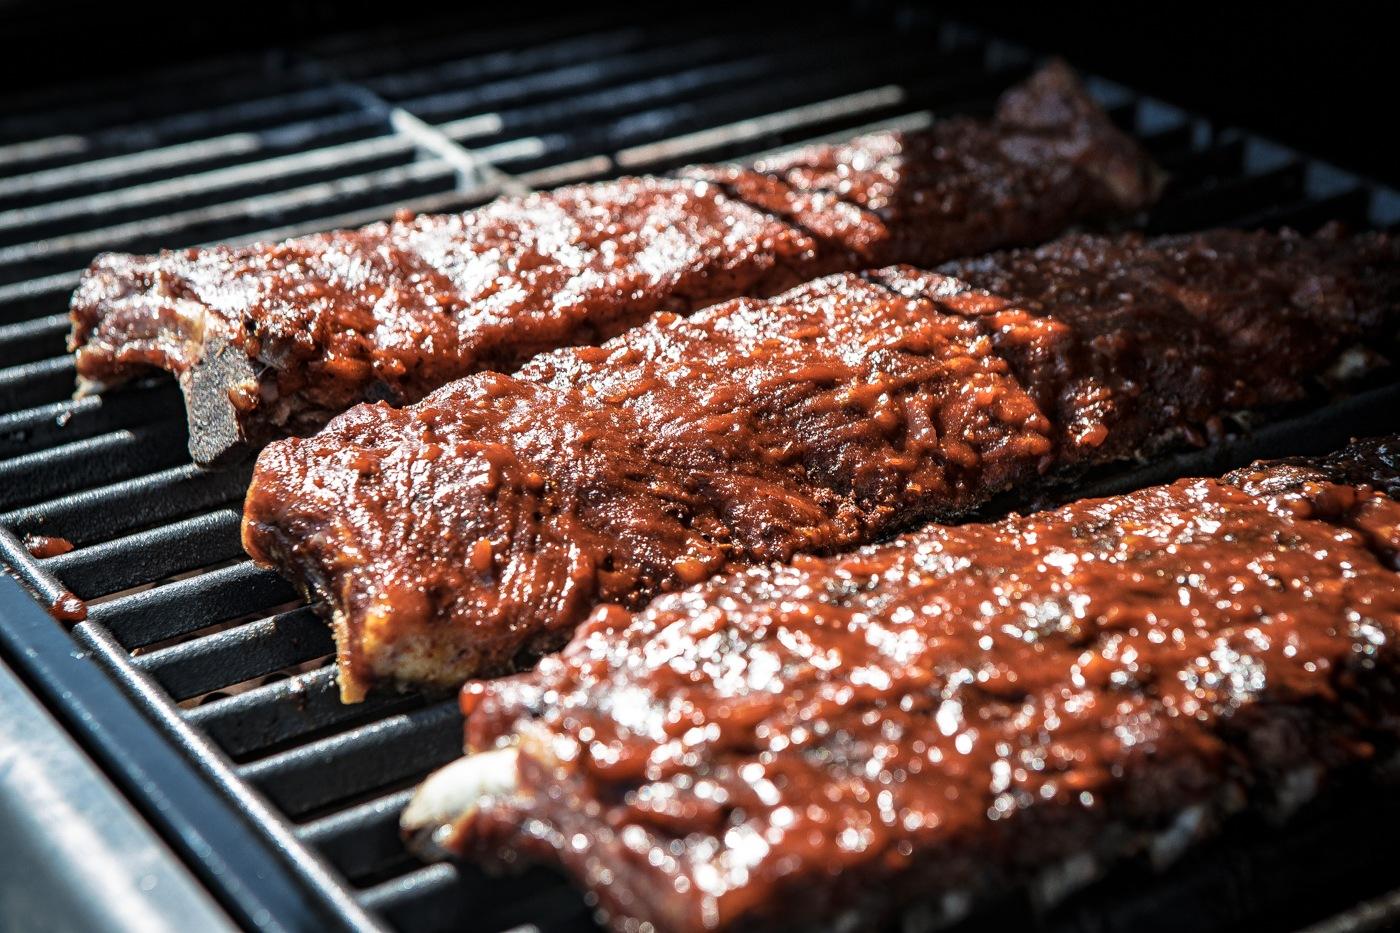 Spareribs Grillen Gasgrill Dauer : 3 2 1 ribs vom gasgrill bbqlicate grill & bbq blog